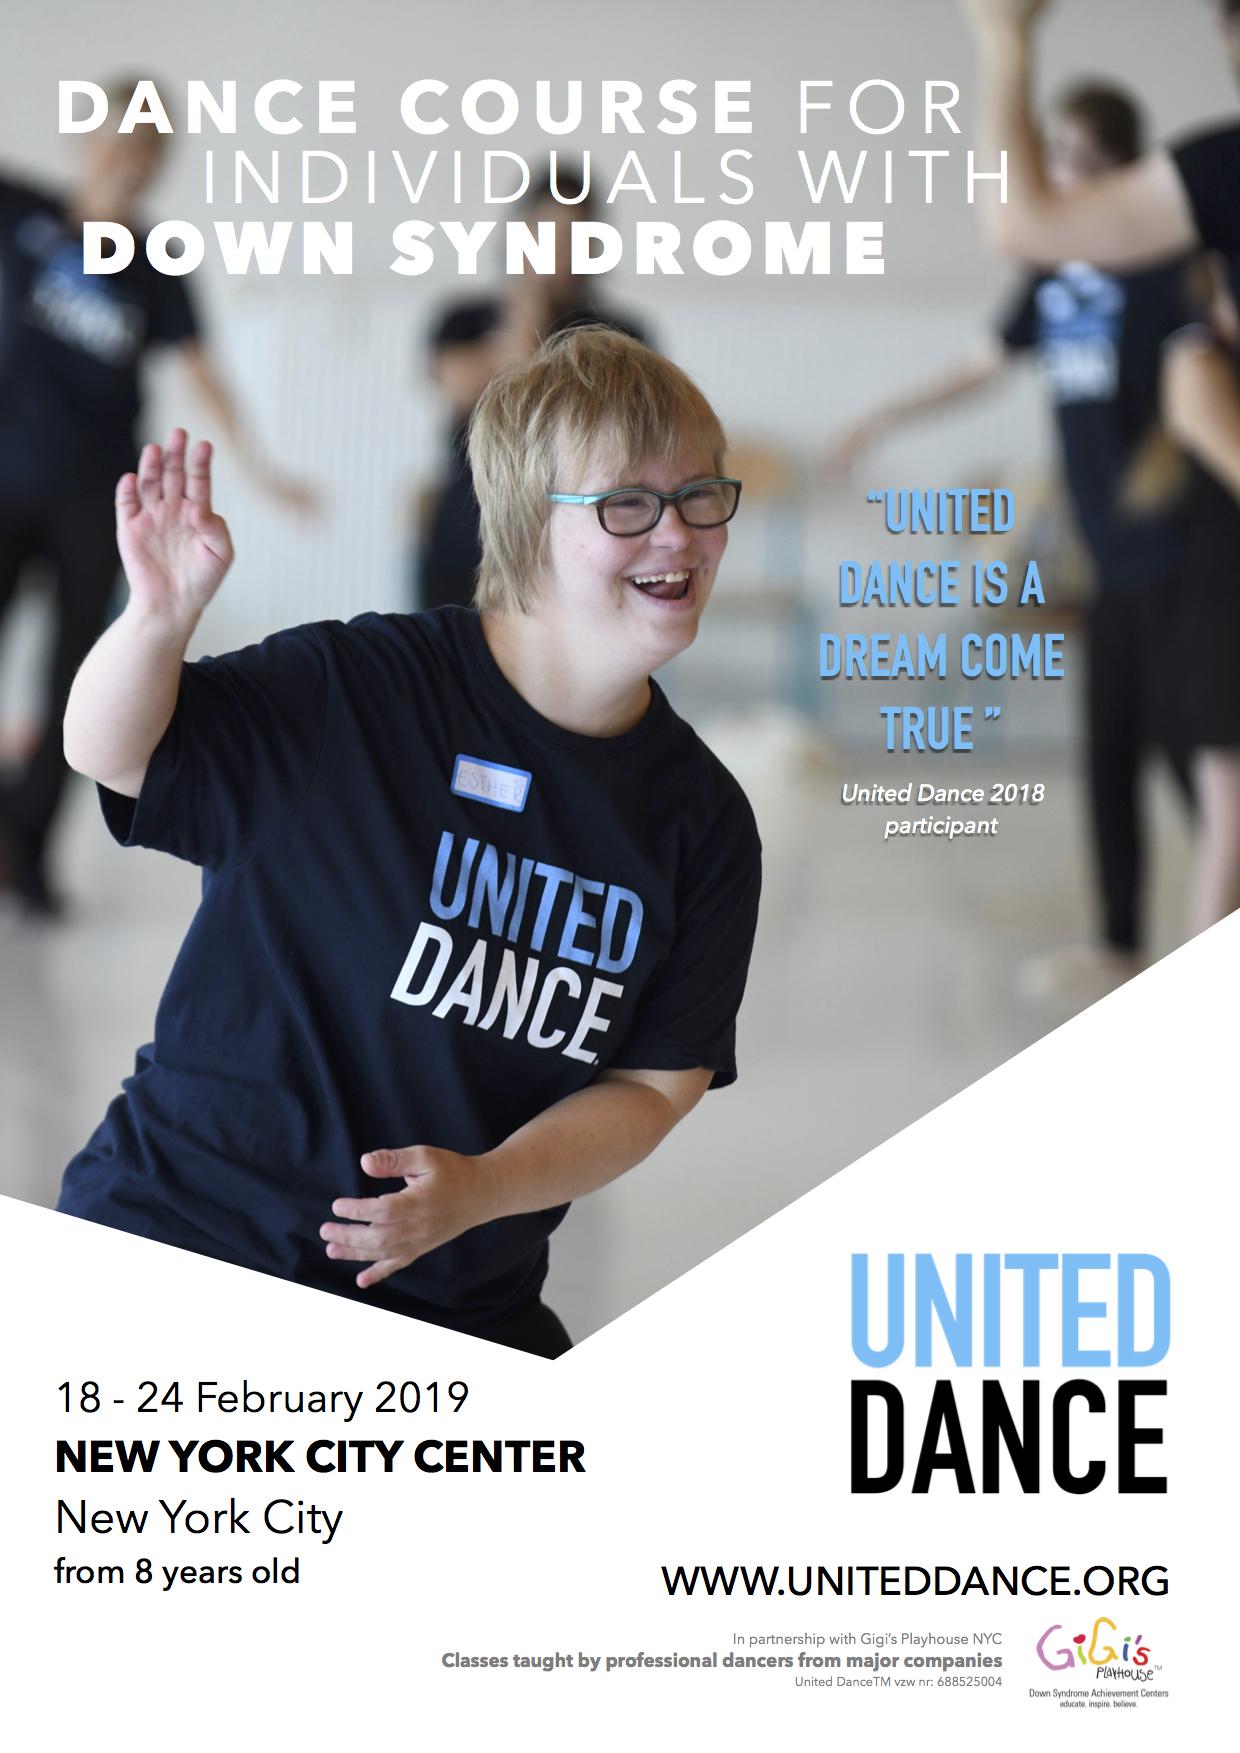 United Dance Poster NYC Feb '19.jpg